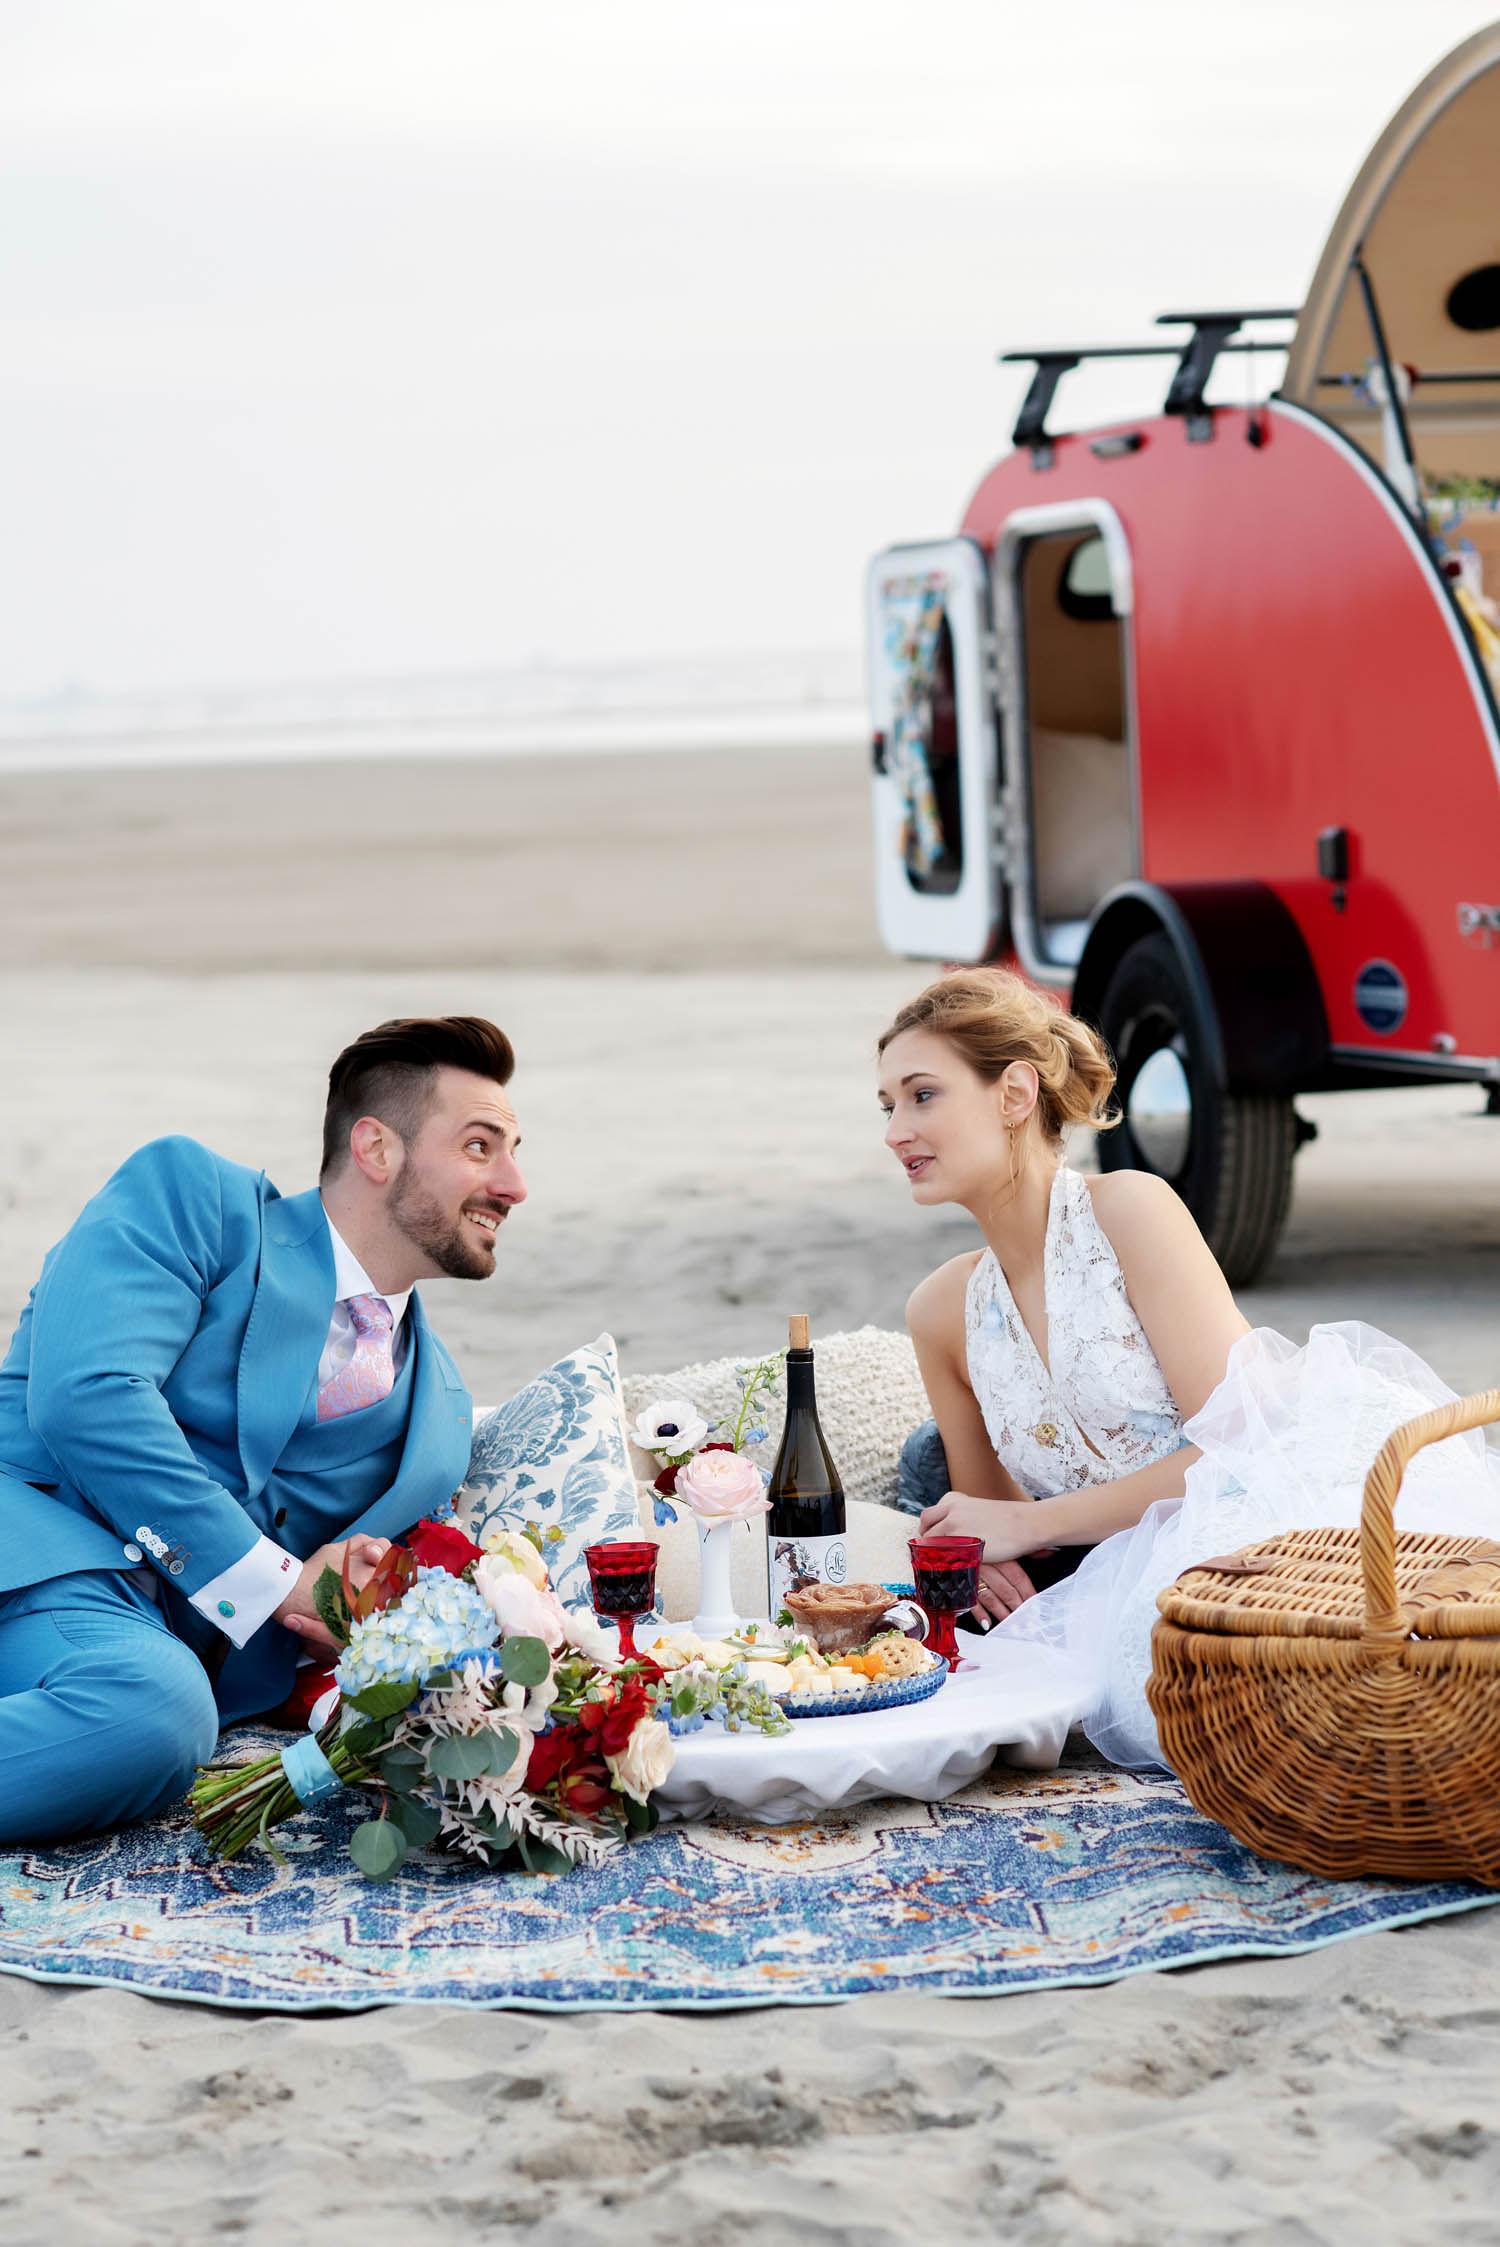 wedding picnic, elopement picnic, beach wedding, adventure elopement, charcuterie board, charcuterie picnic, bride and groom